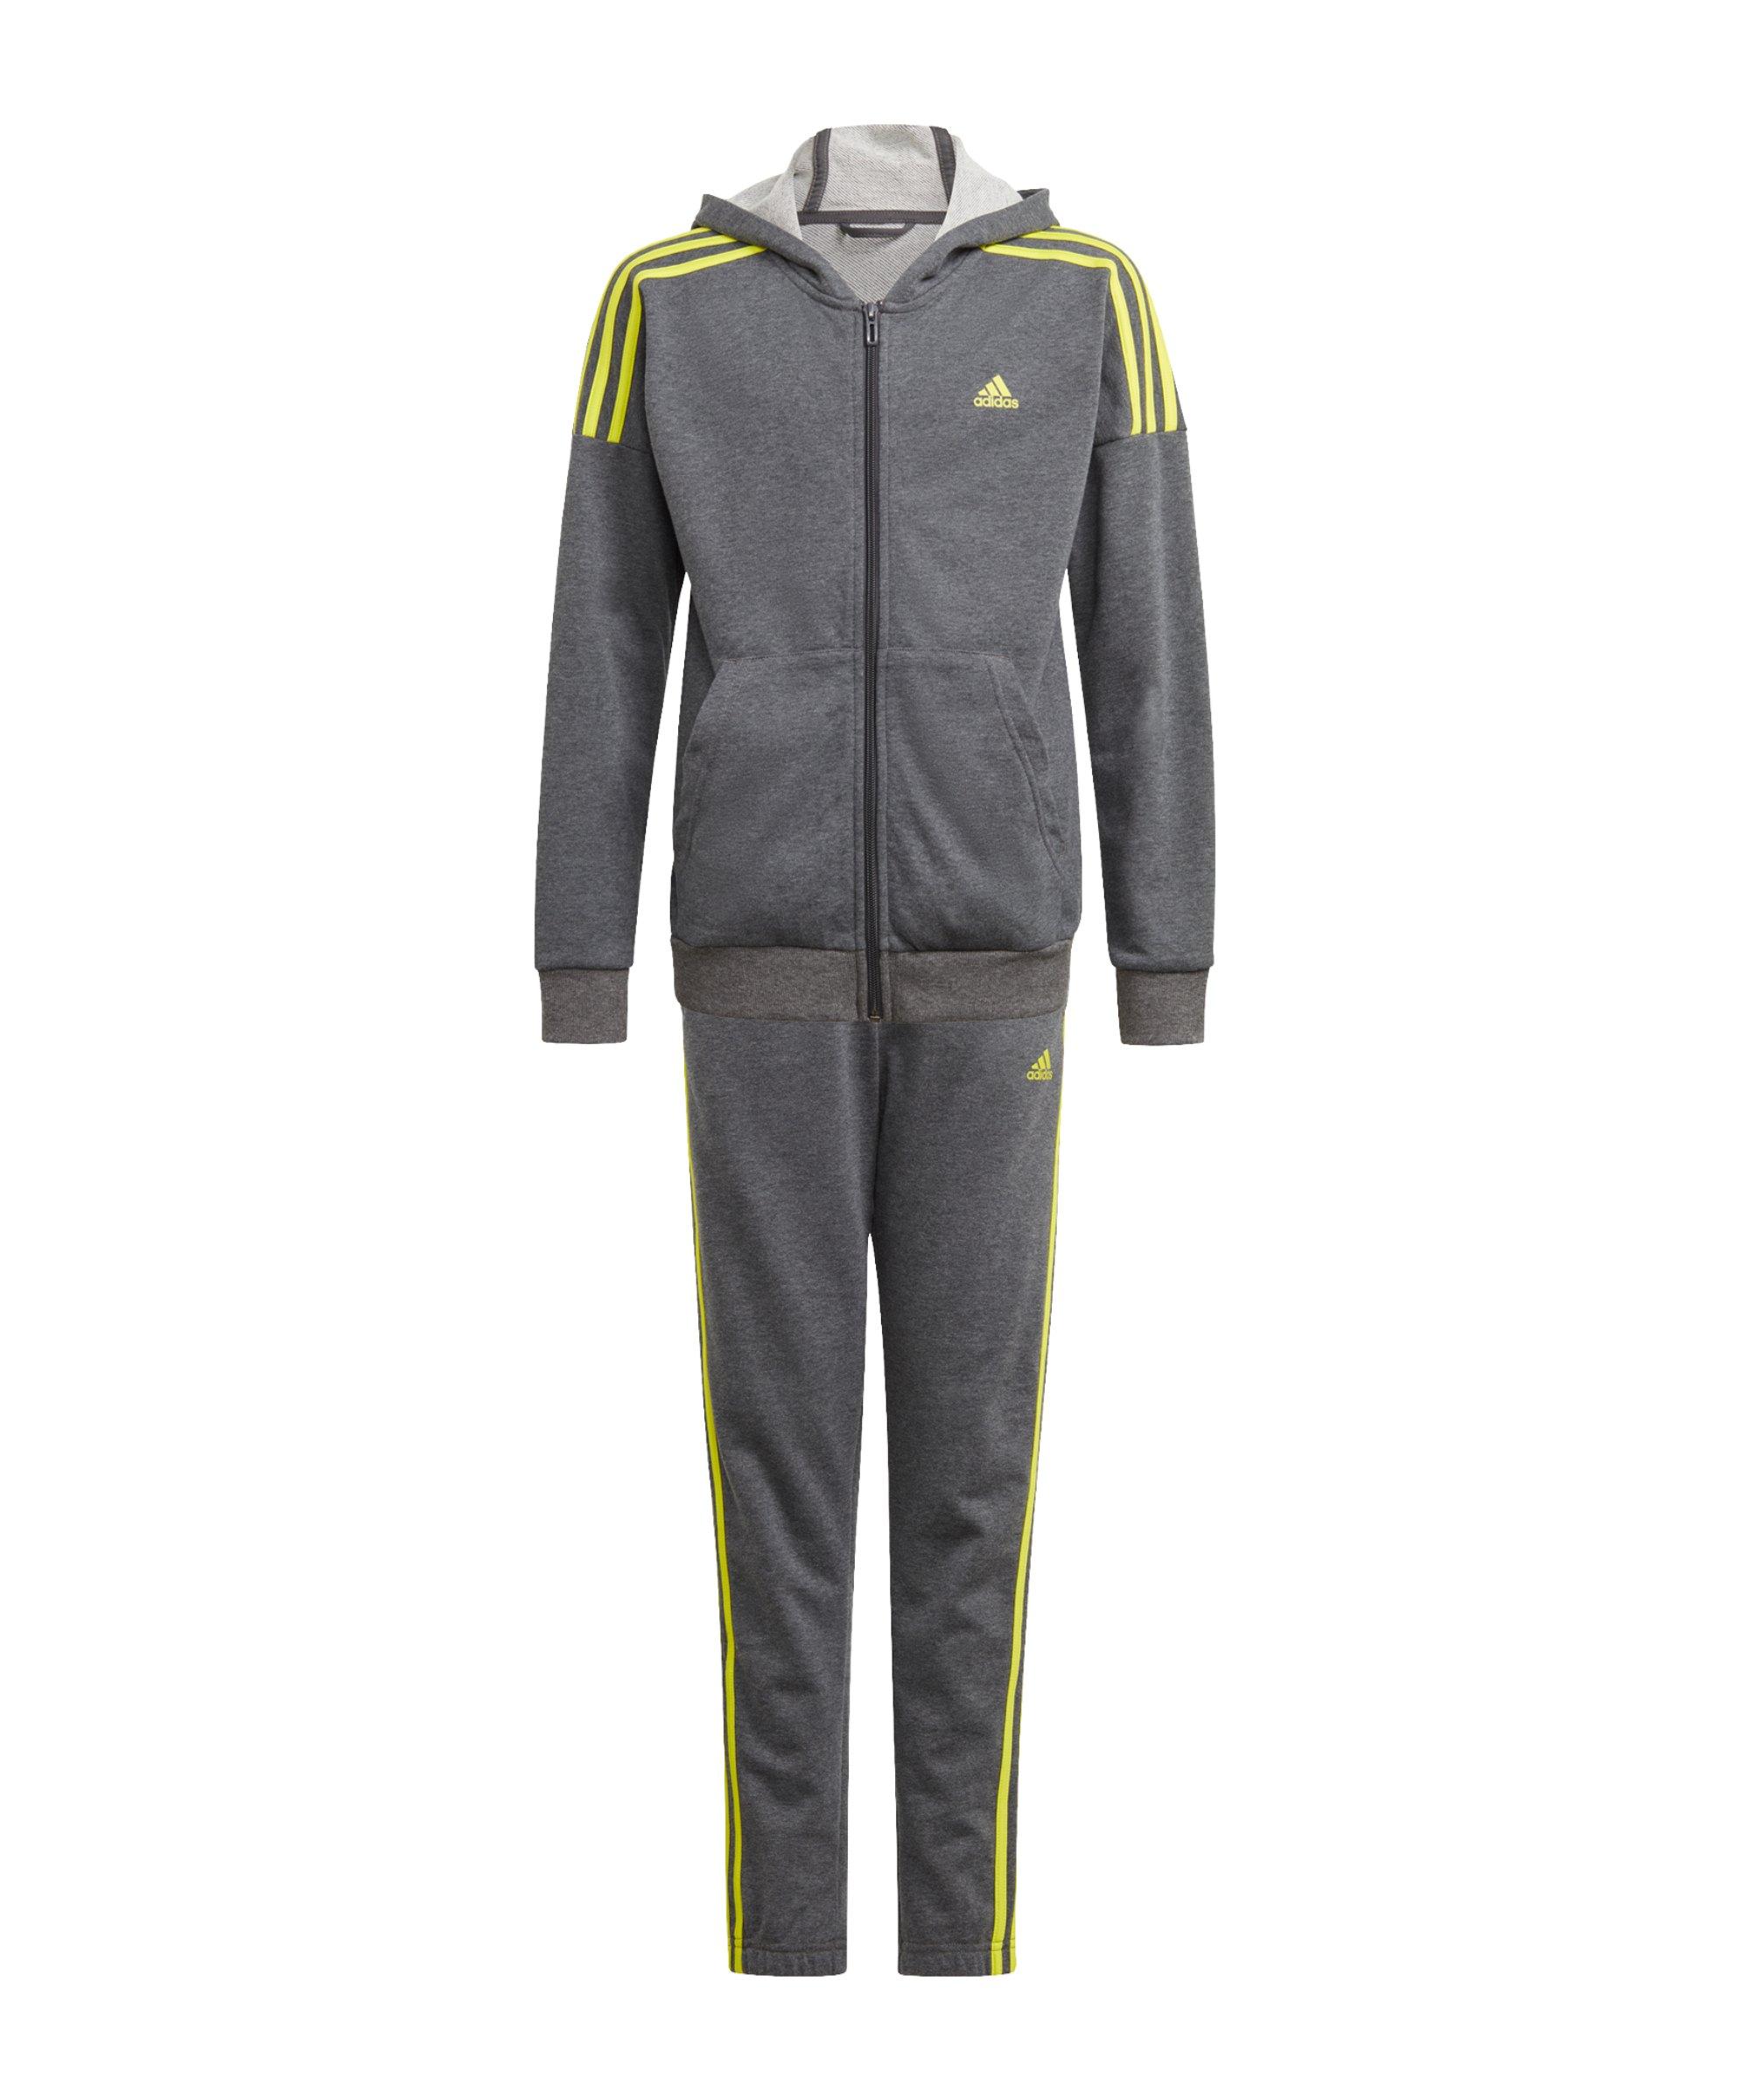 adidas Jogginganzug Kids Grau Gelb - grau